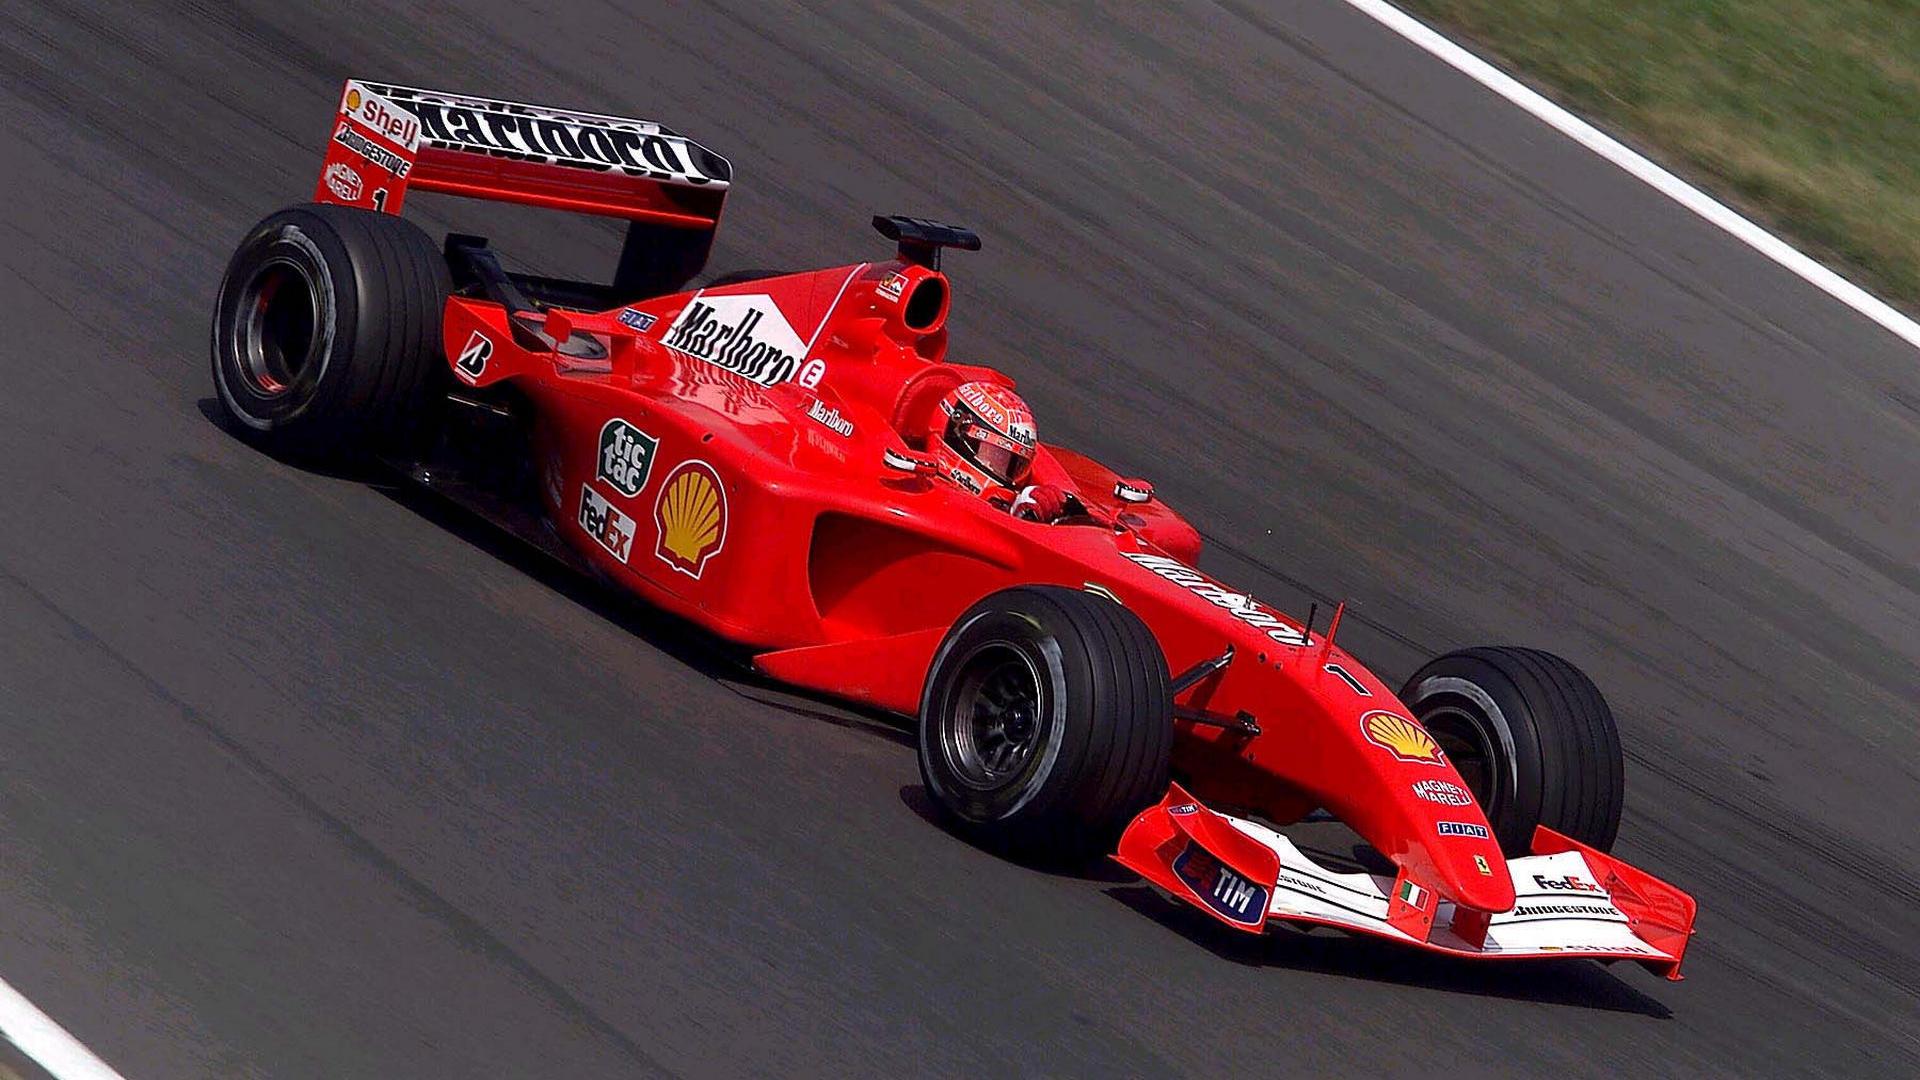 HD Wallpapers 2001 Formula 1 Grand Prix of Hungary | F1-Fansite.com